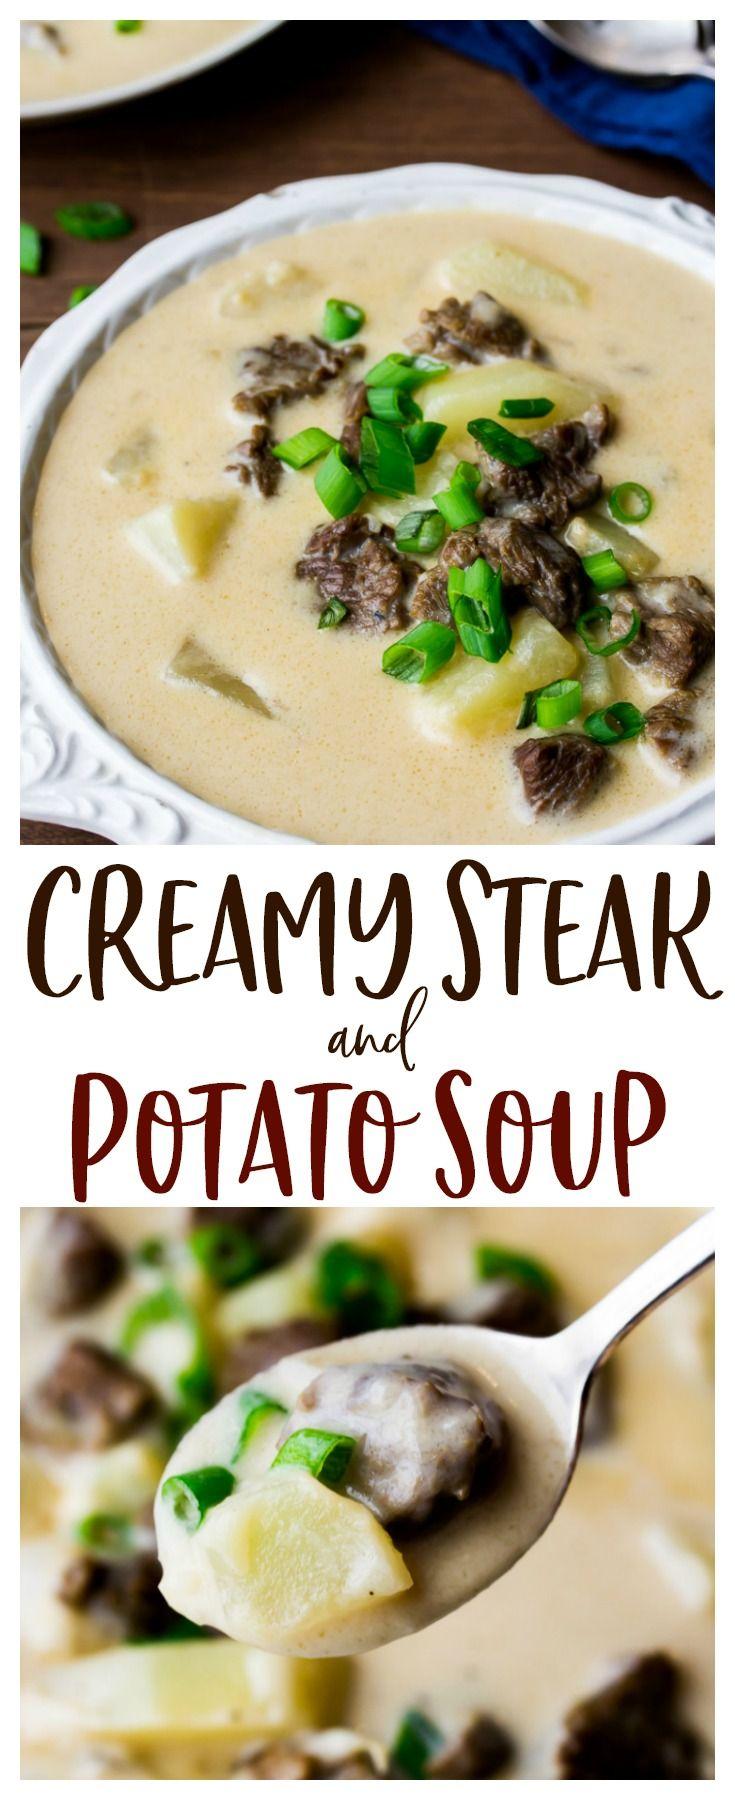 Creamy Steak and Potato Soup